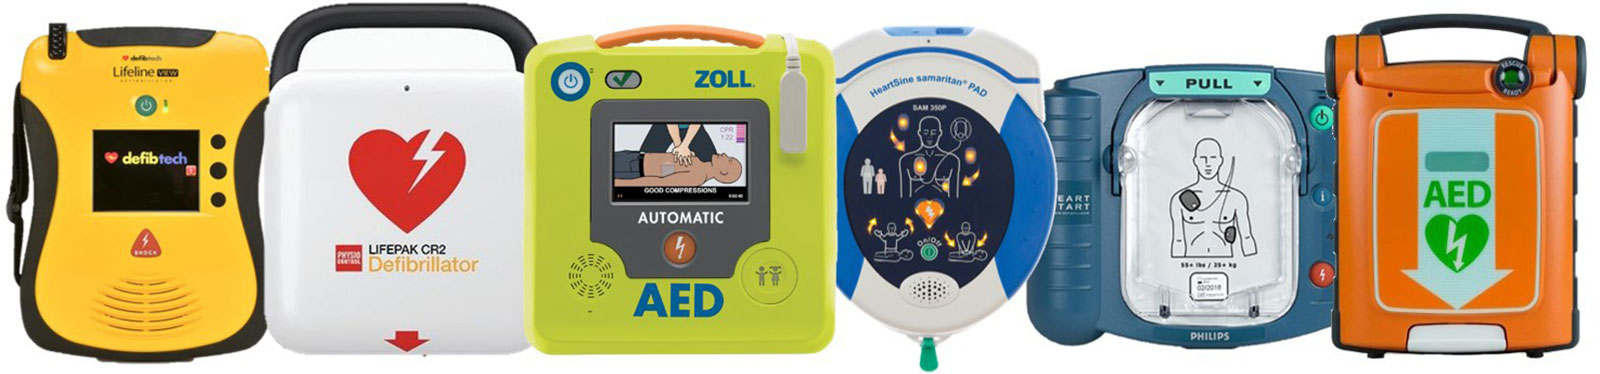 AEDs and Defibrillators